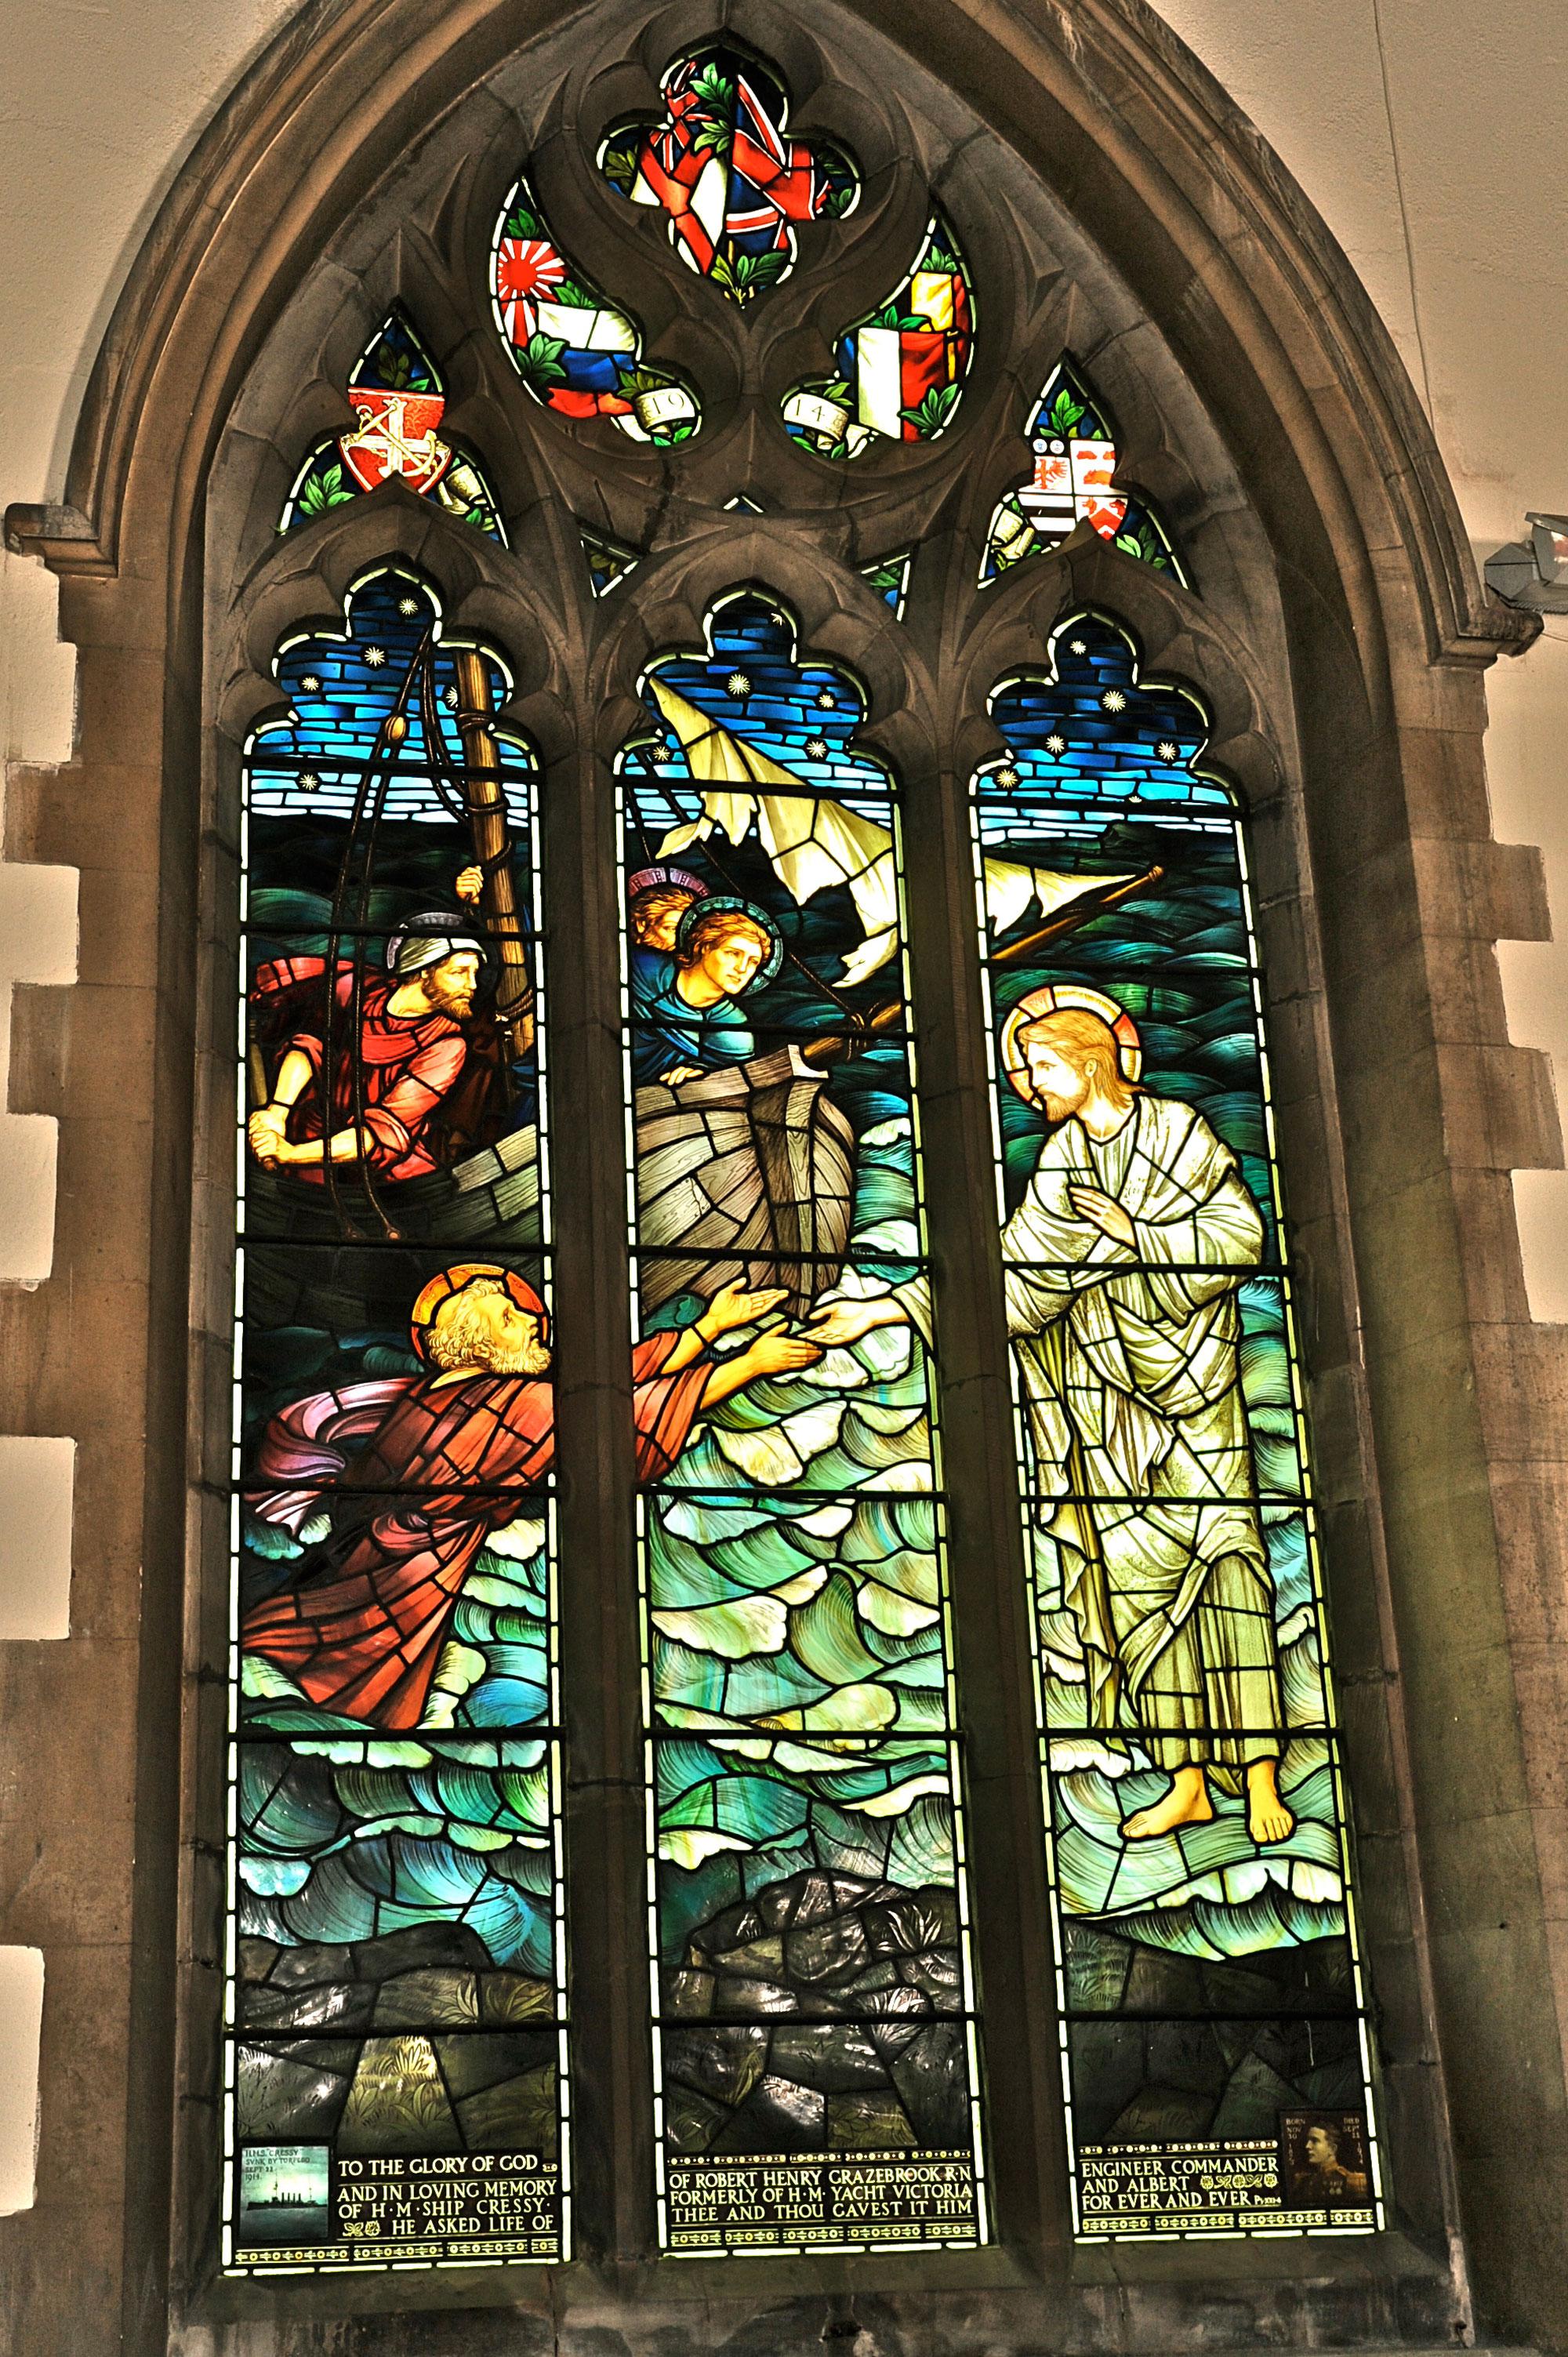 Stourbridge Oldswinford St. Mary